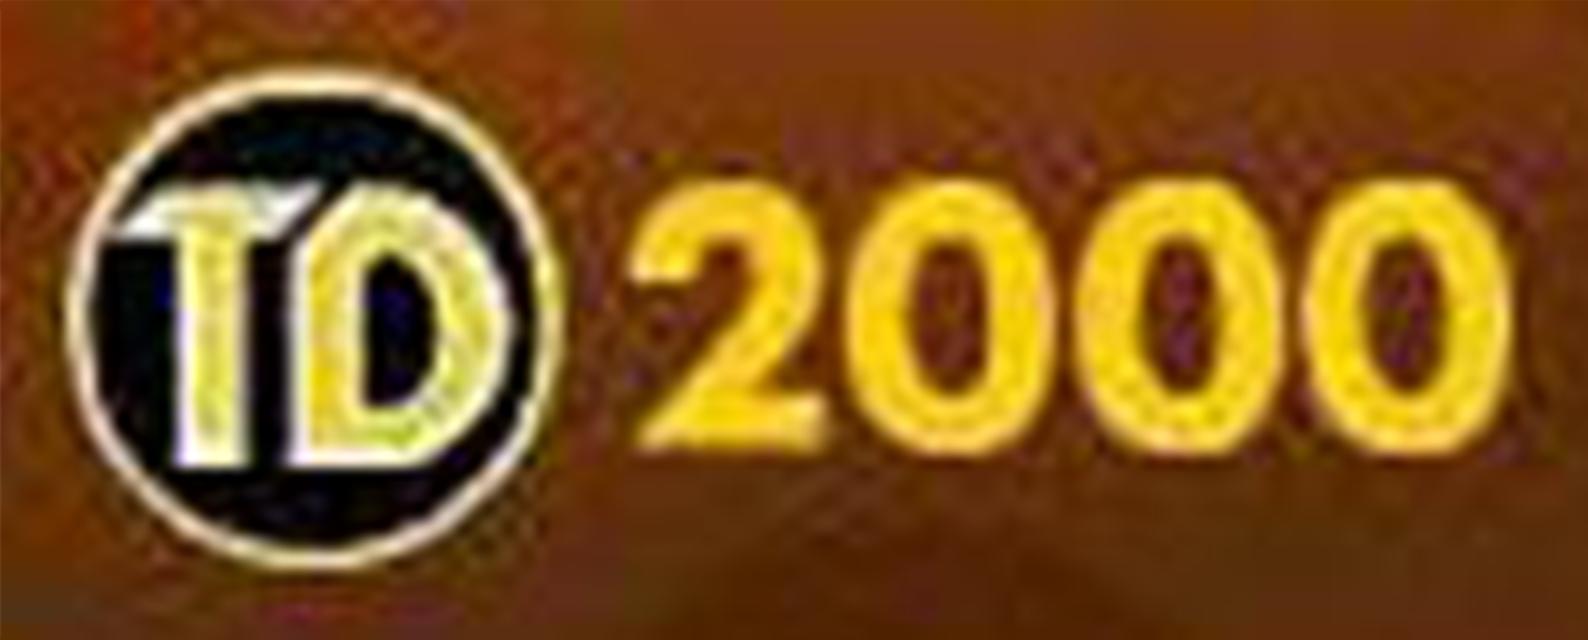 TD 2000 logo